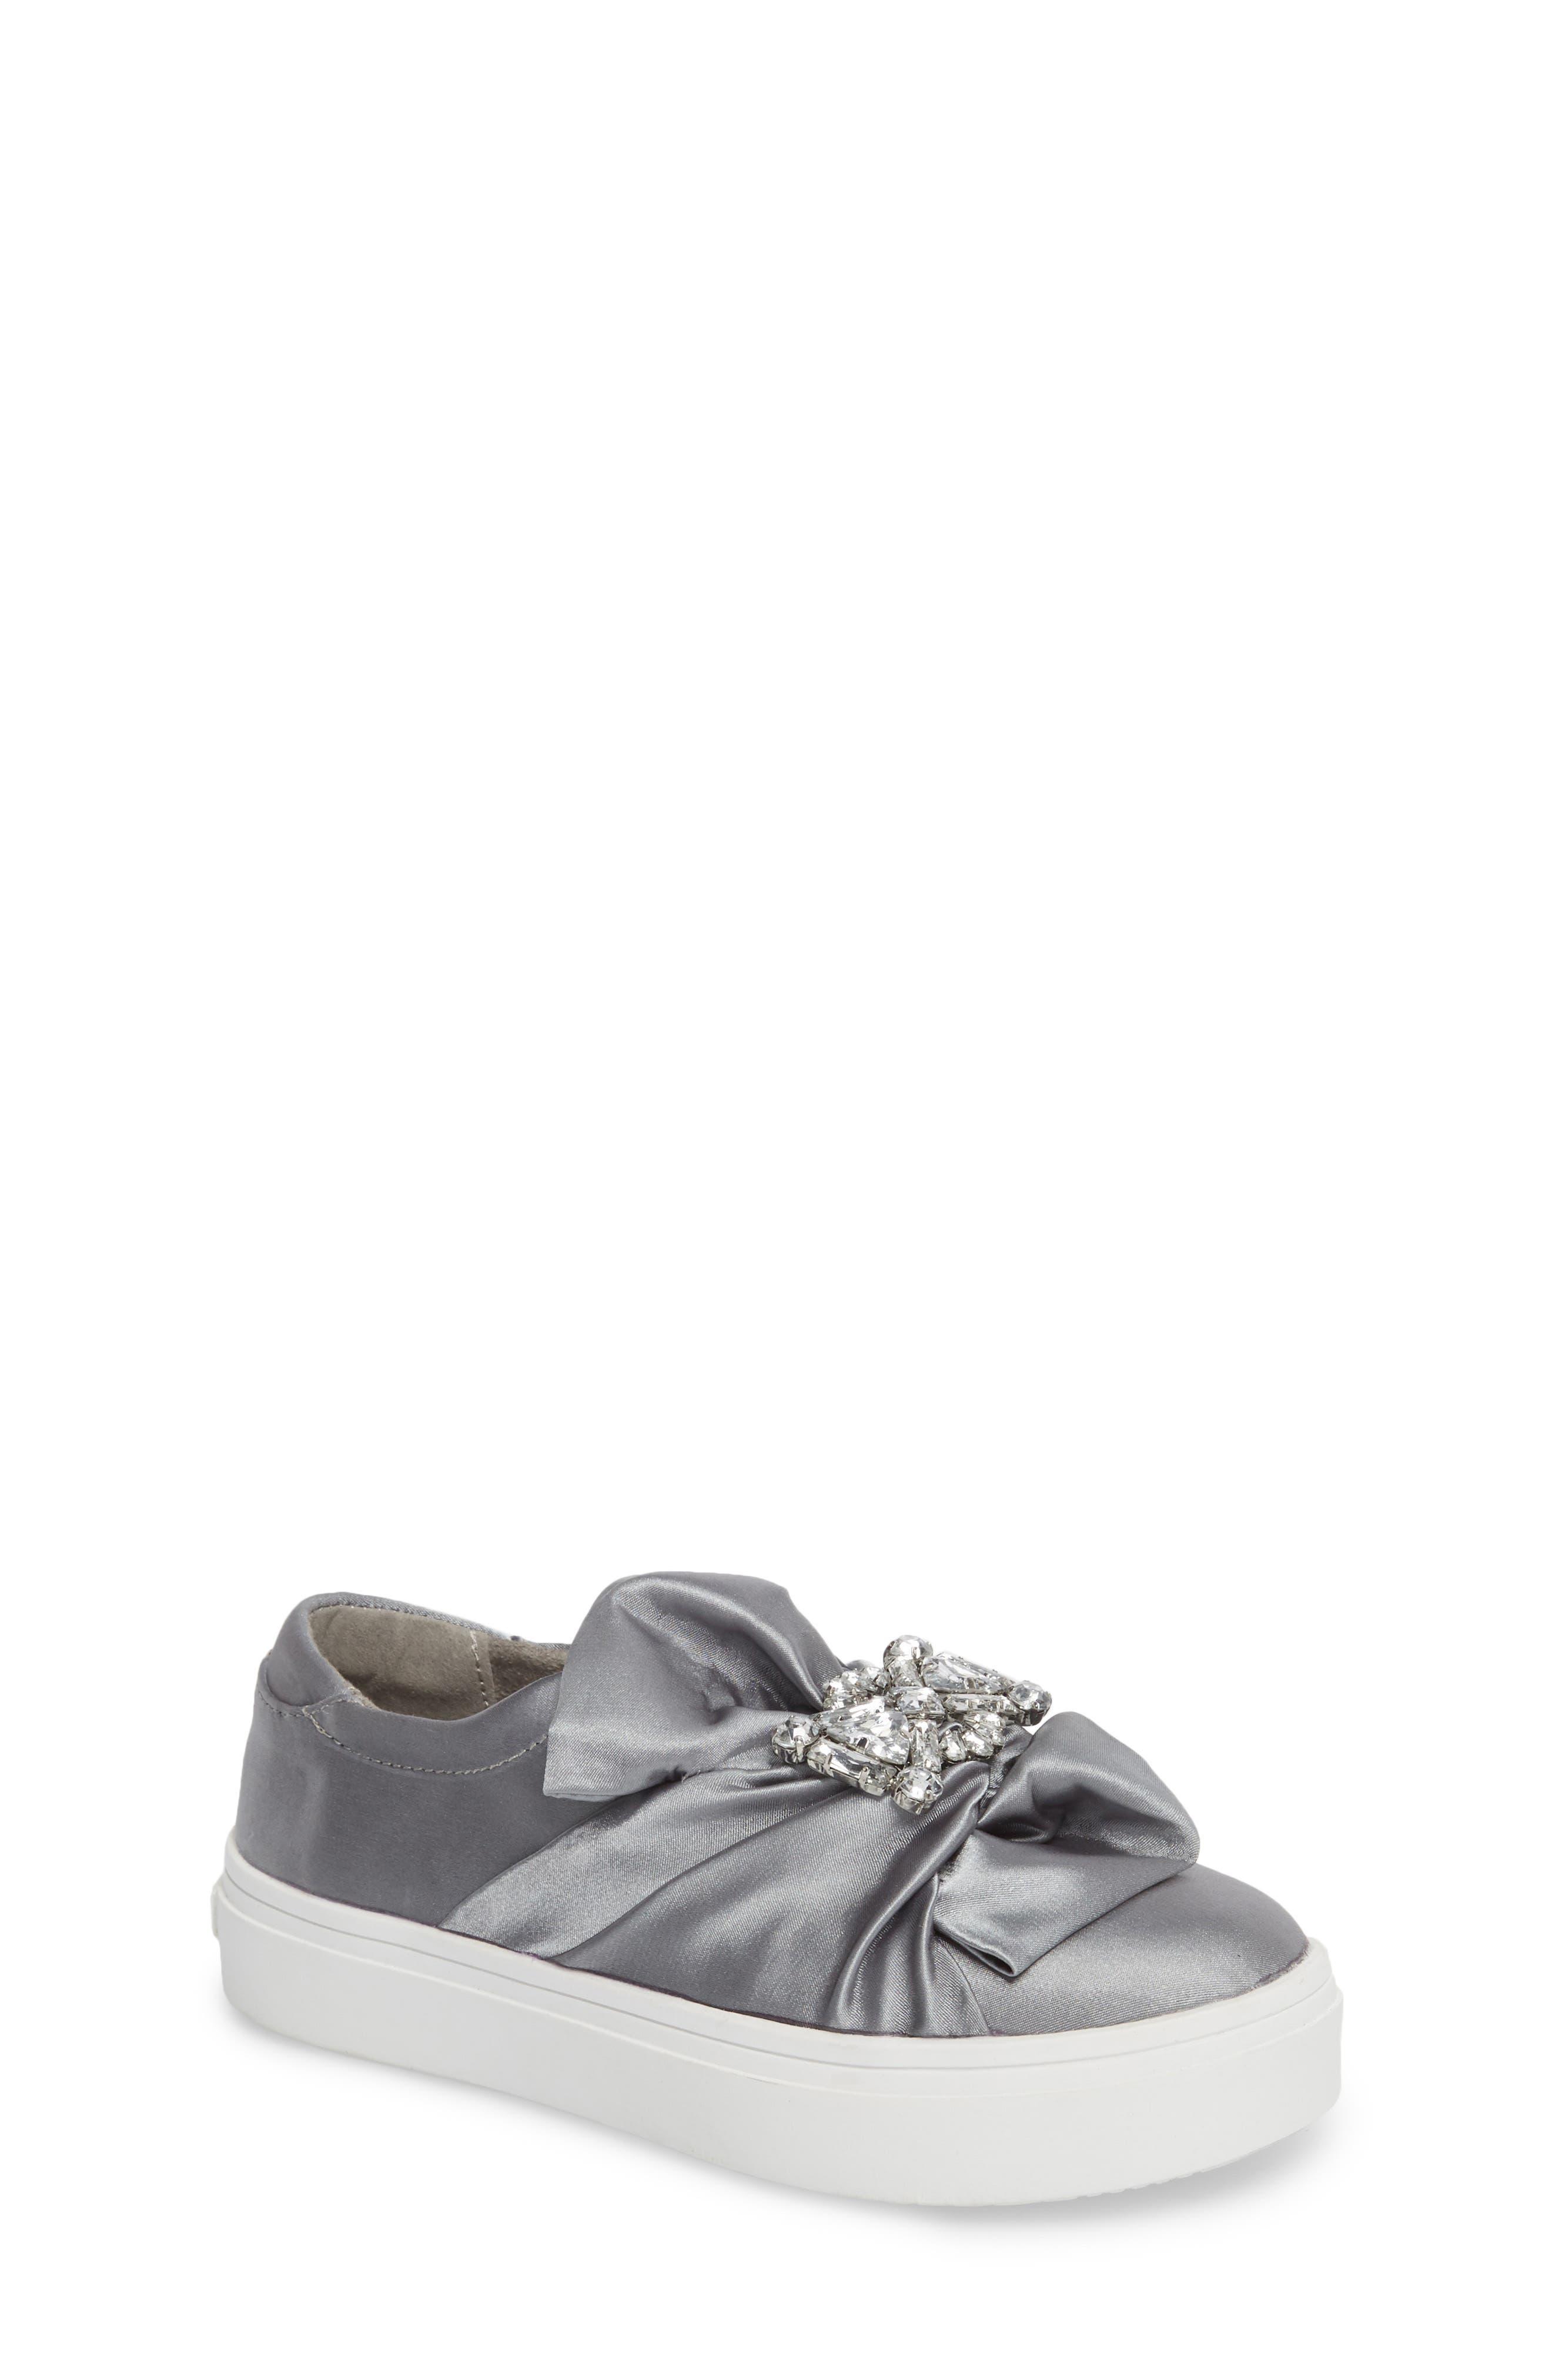 Shout Shine Embellished Sneaker,                             Main thumbnail 1, color,                             Gray